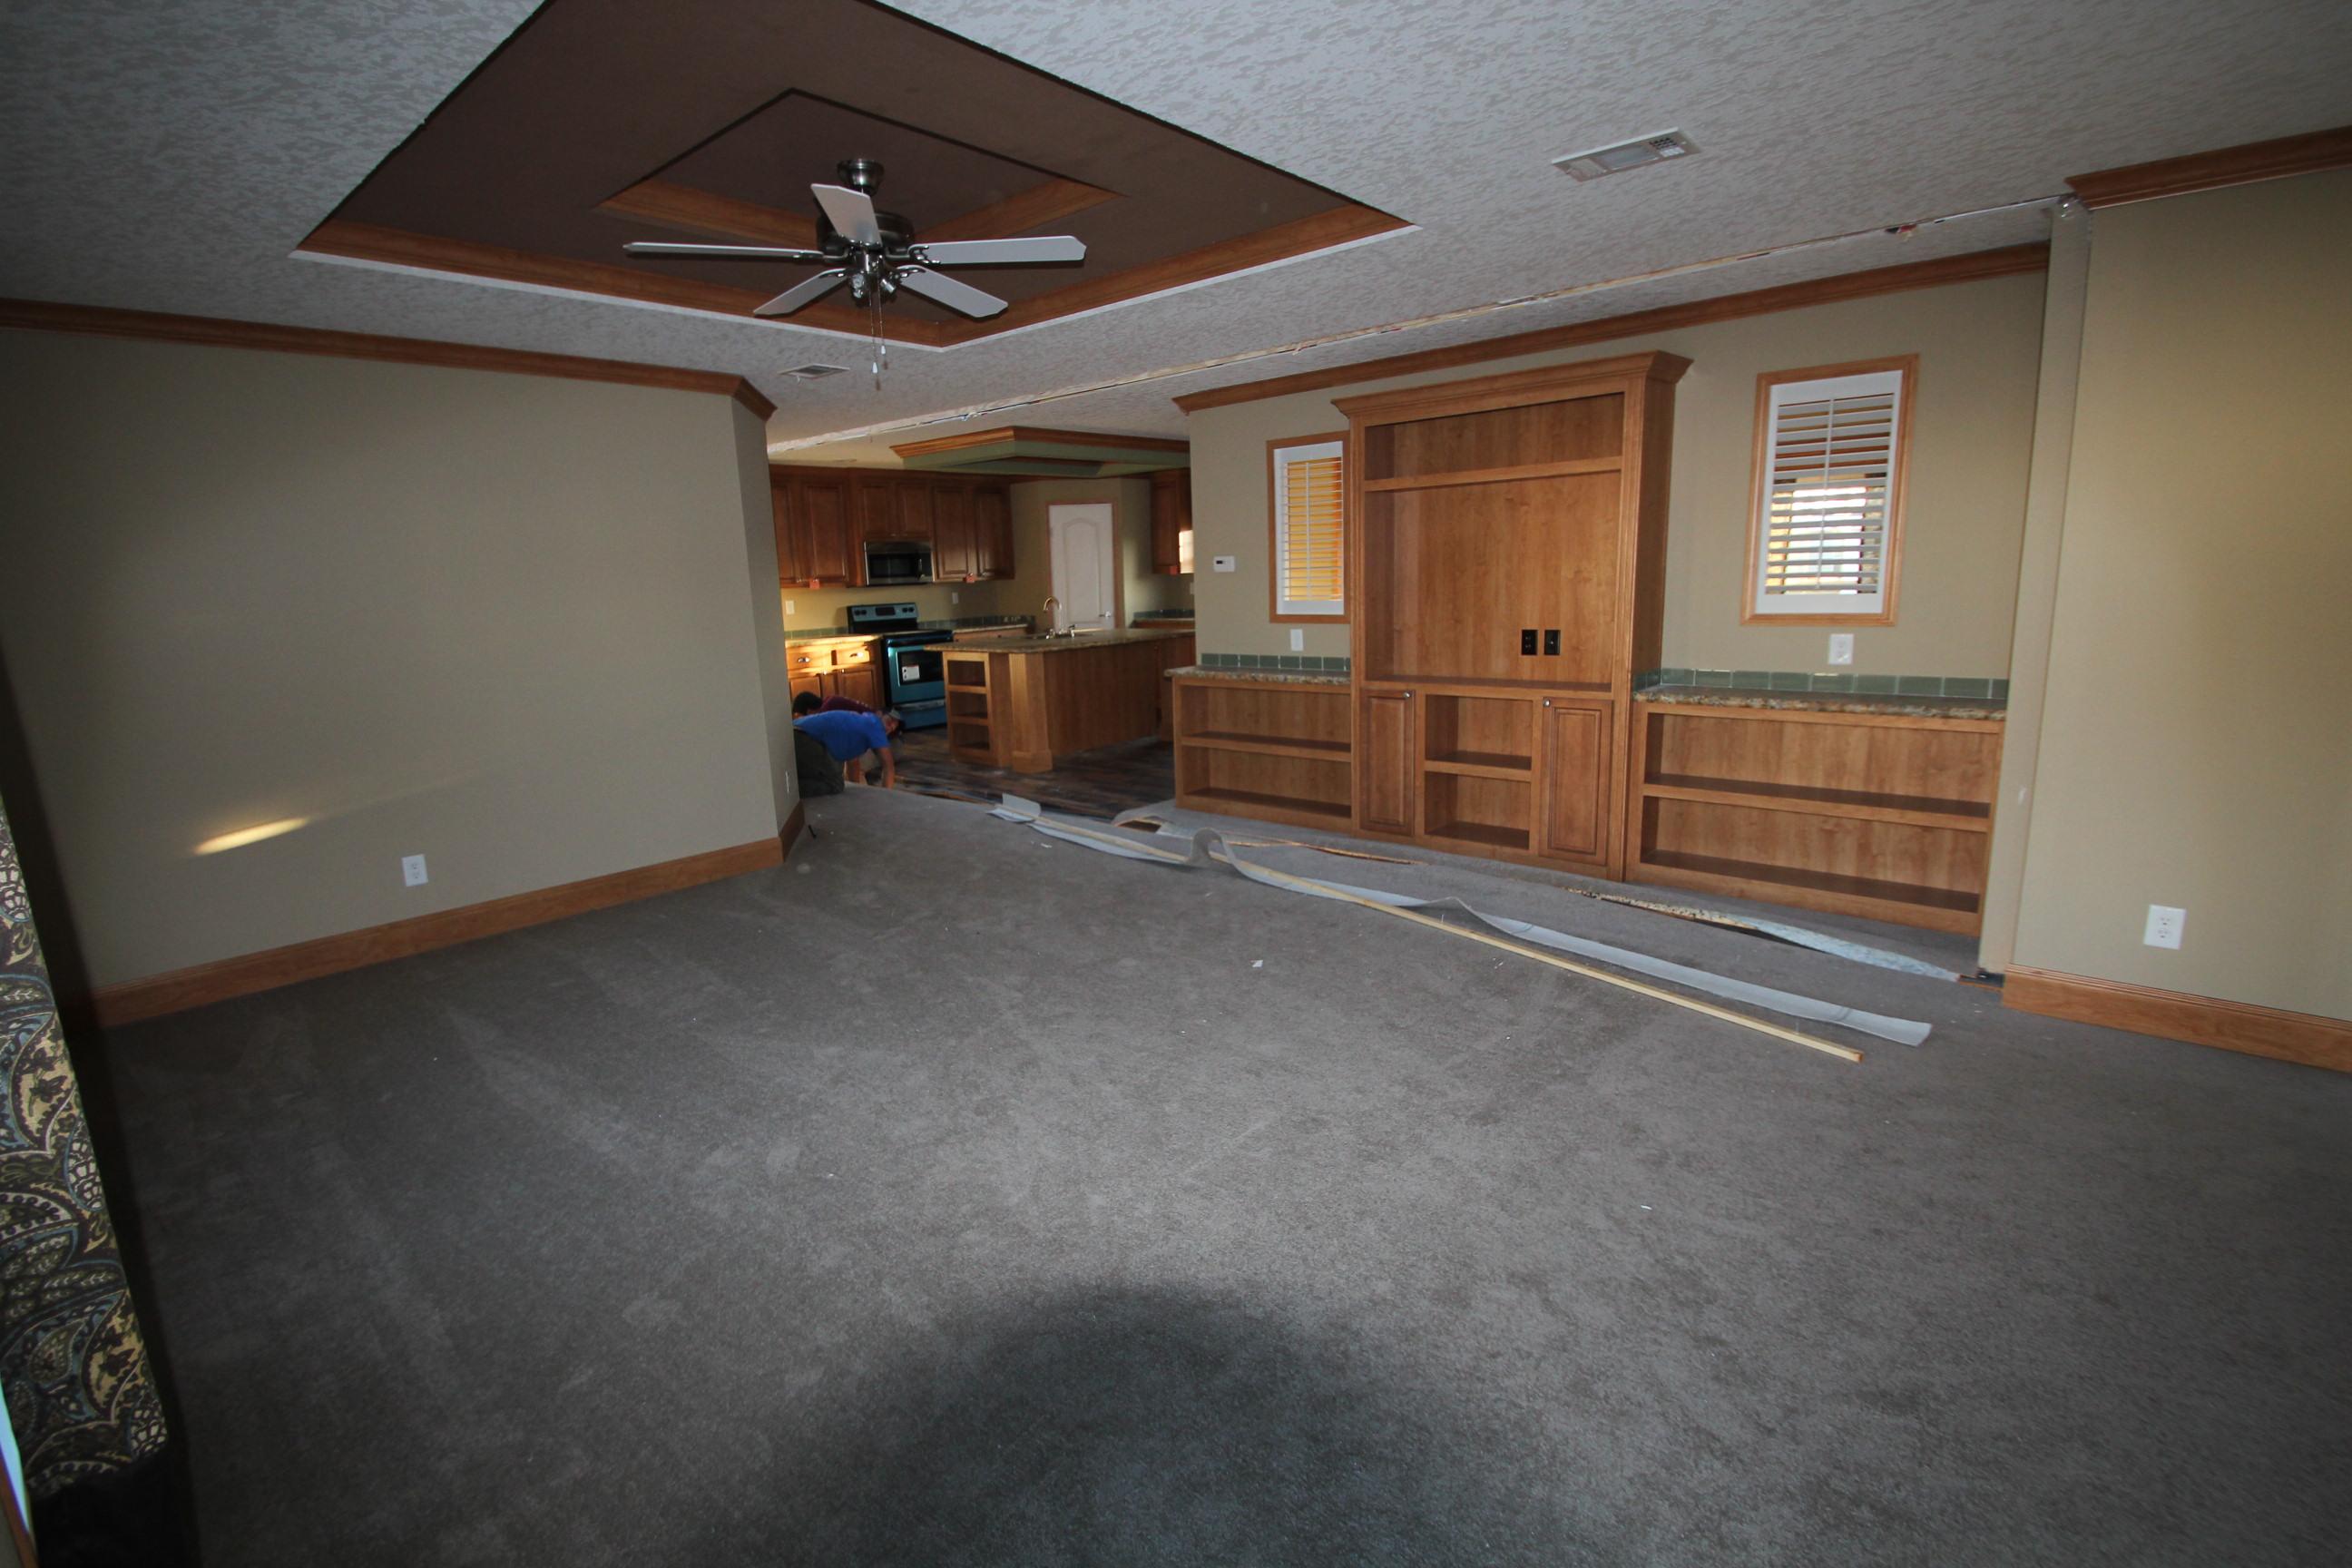 2015 Scotbilt 32x80 - Southern Heritage Homes